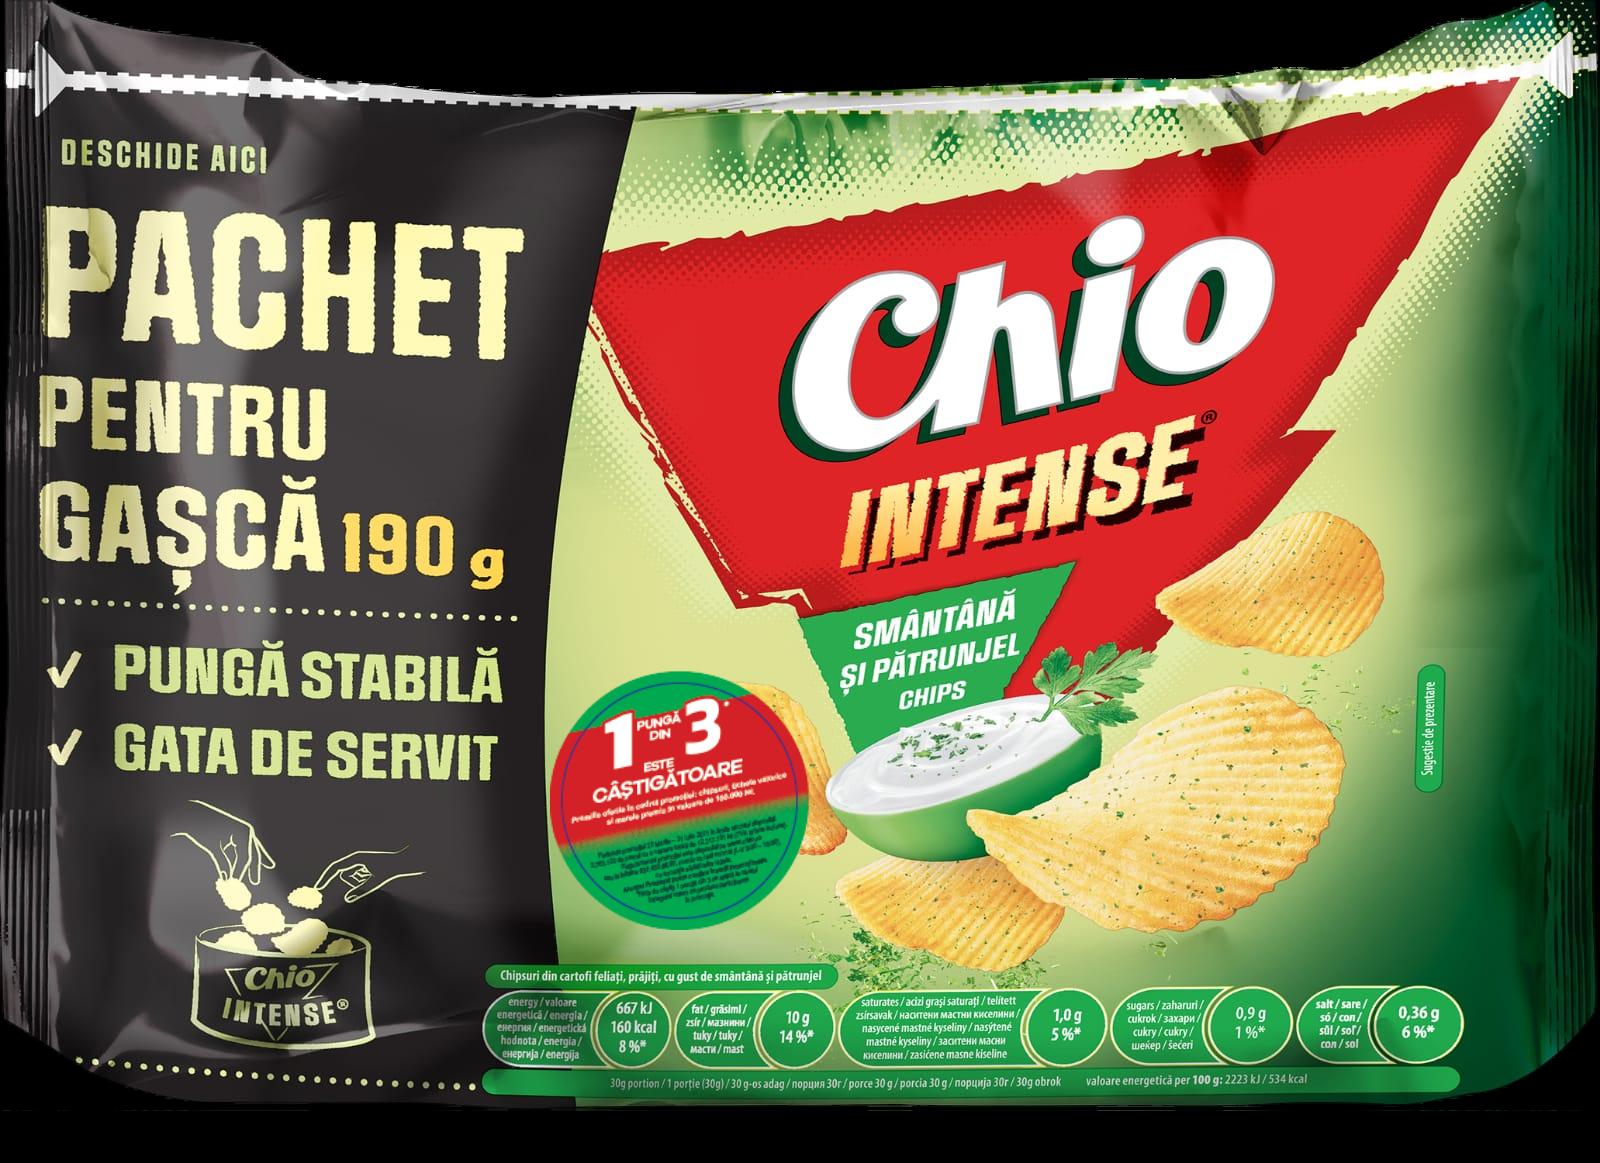 https://chio.ro/wp-content/themes/chio/1din3/Chio Chips Intense Pachet Smantana Patrunjel